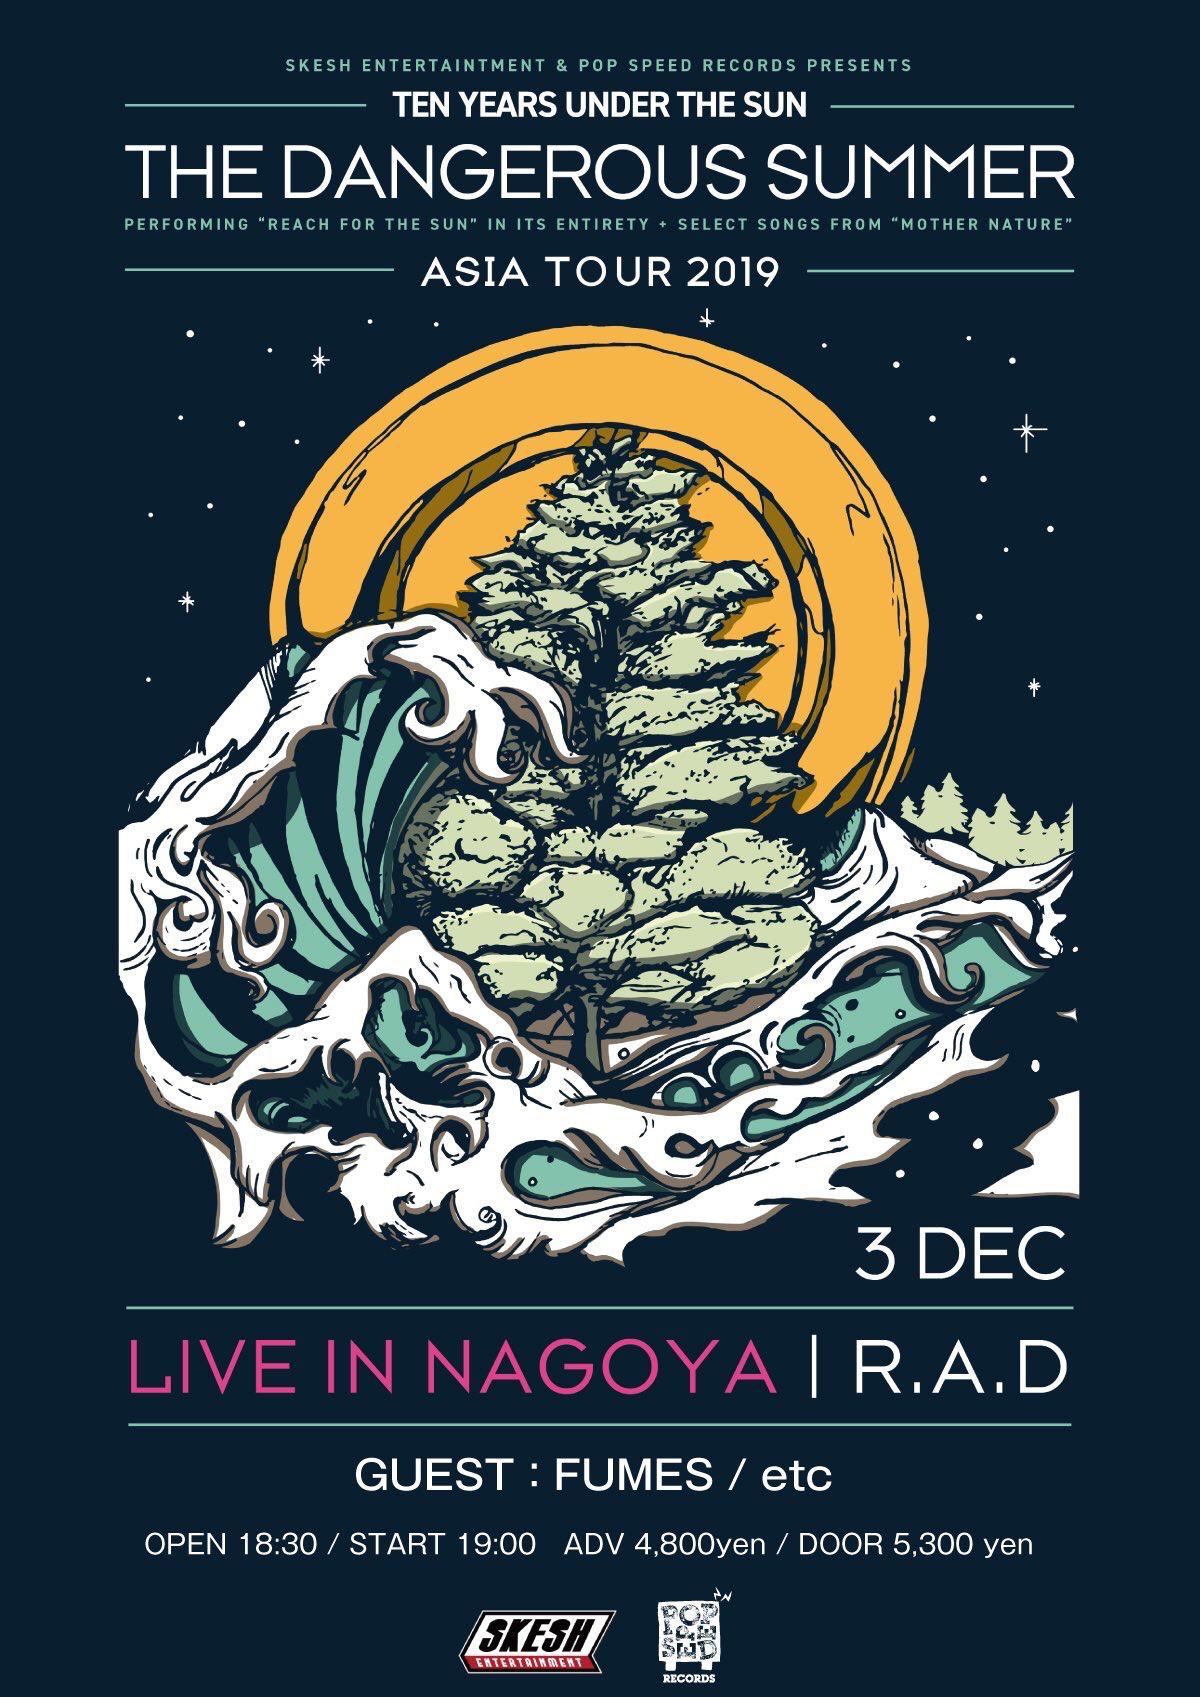 THE DANGEROUS SUMMER ASIA TOUR 2019